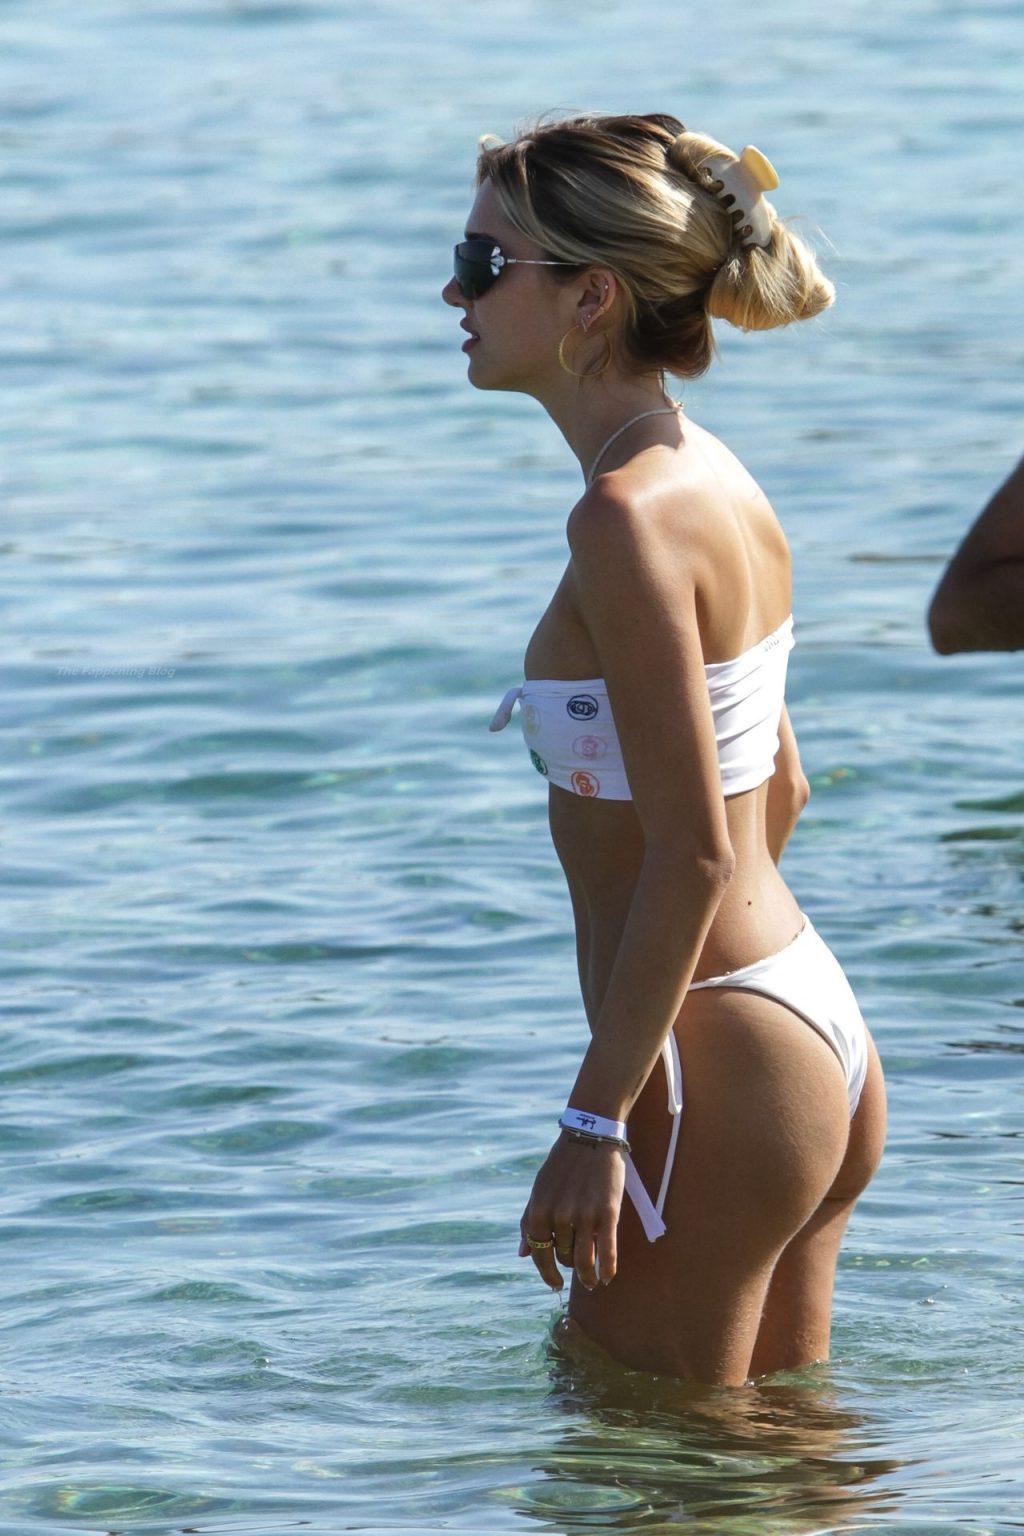 Delilah Belle Hamlin Looks Sensational in a Barely-There Bikini in Mykonos (49 Photos)